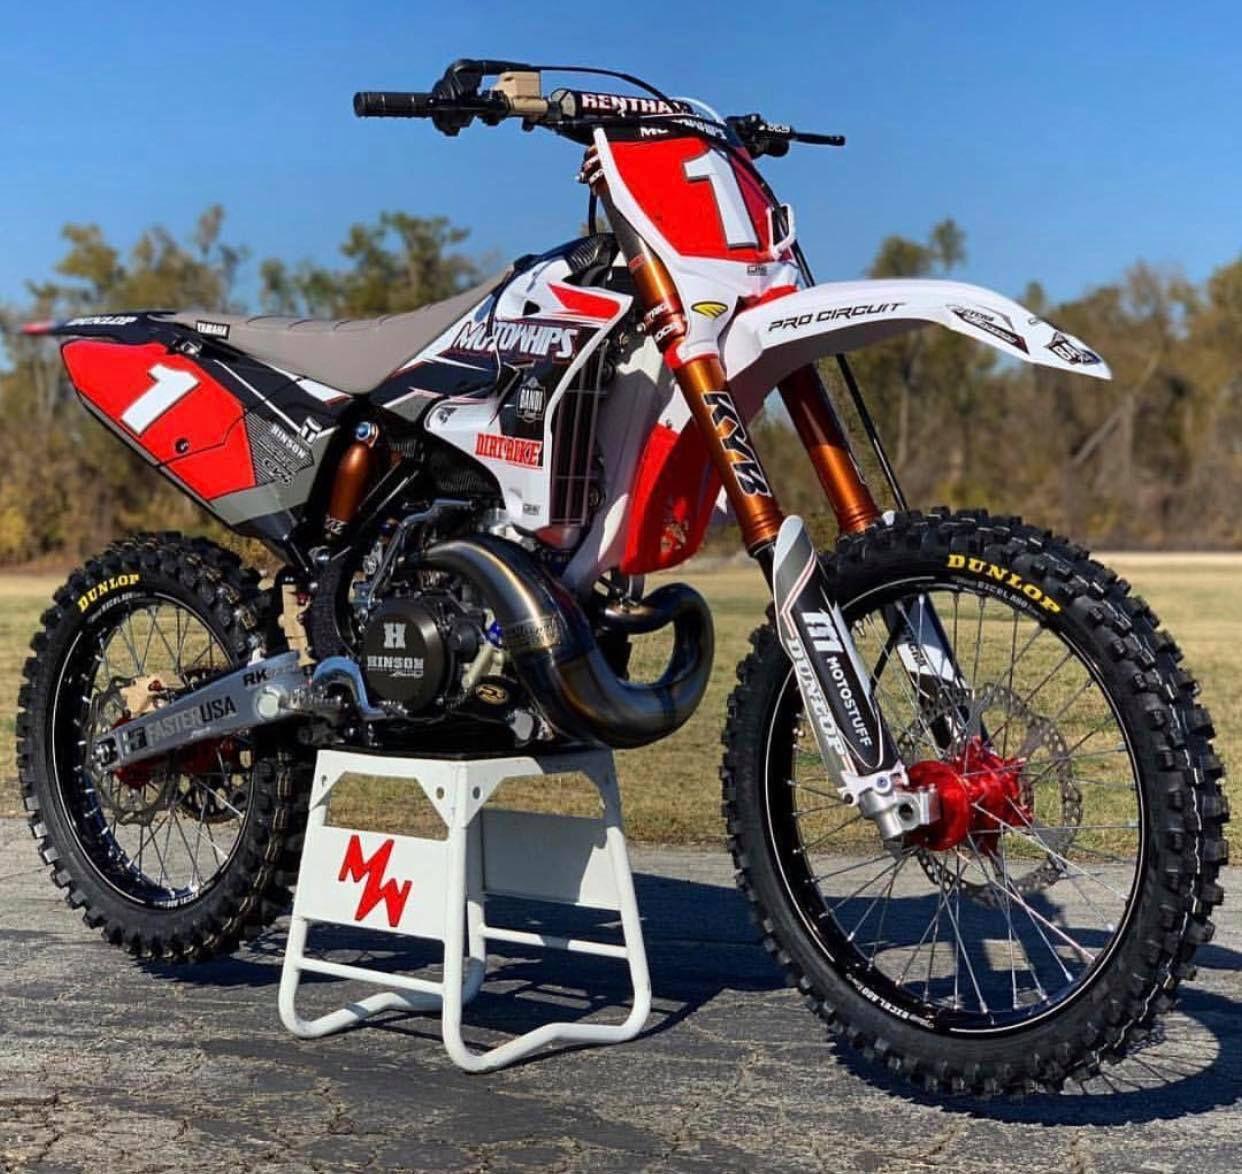 Dirt Bike Motowhips Project Yz250 Motorcross Bike Cool Dirt